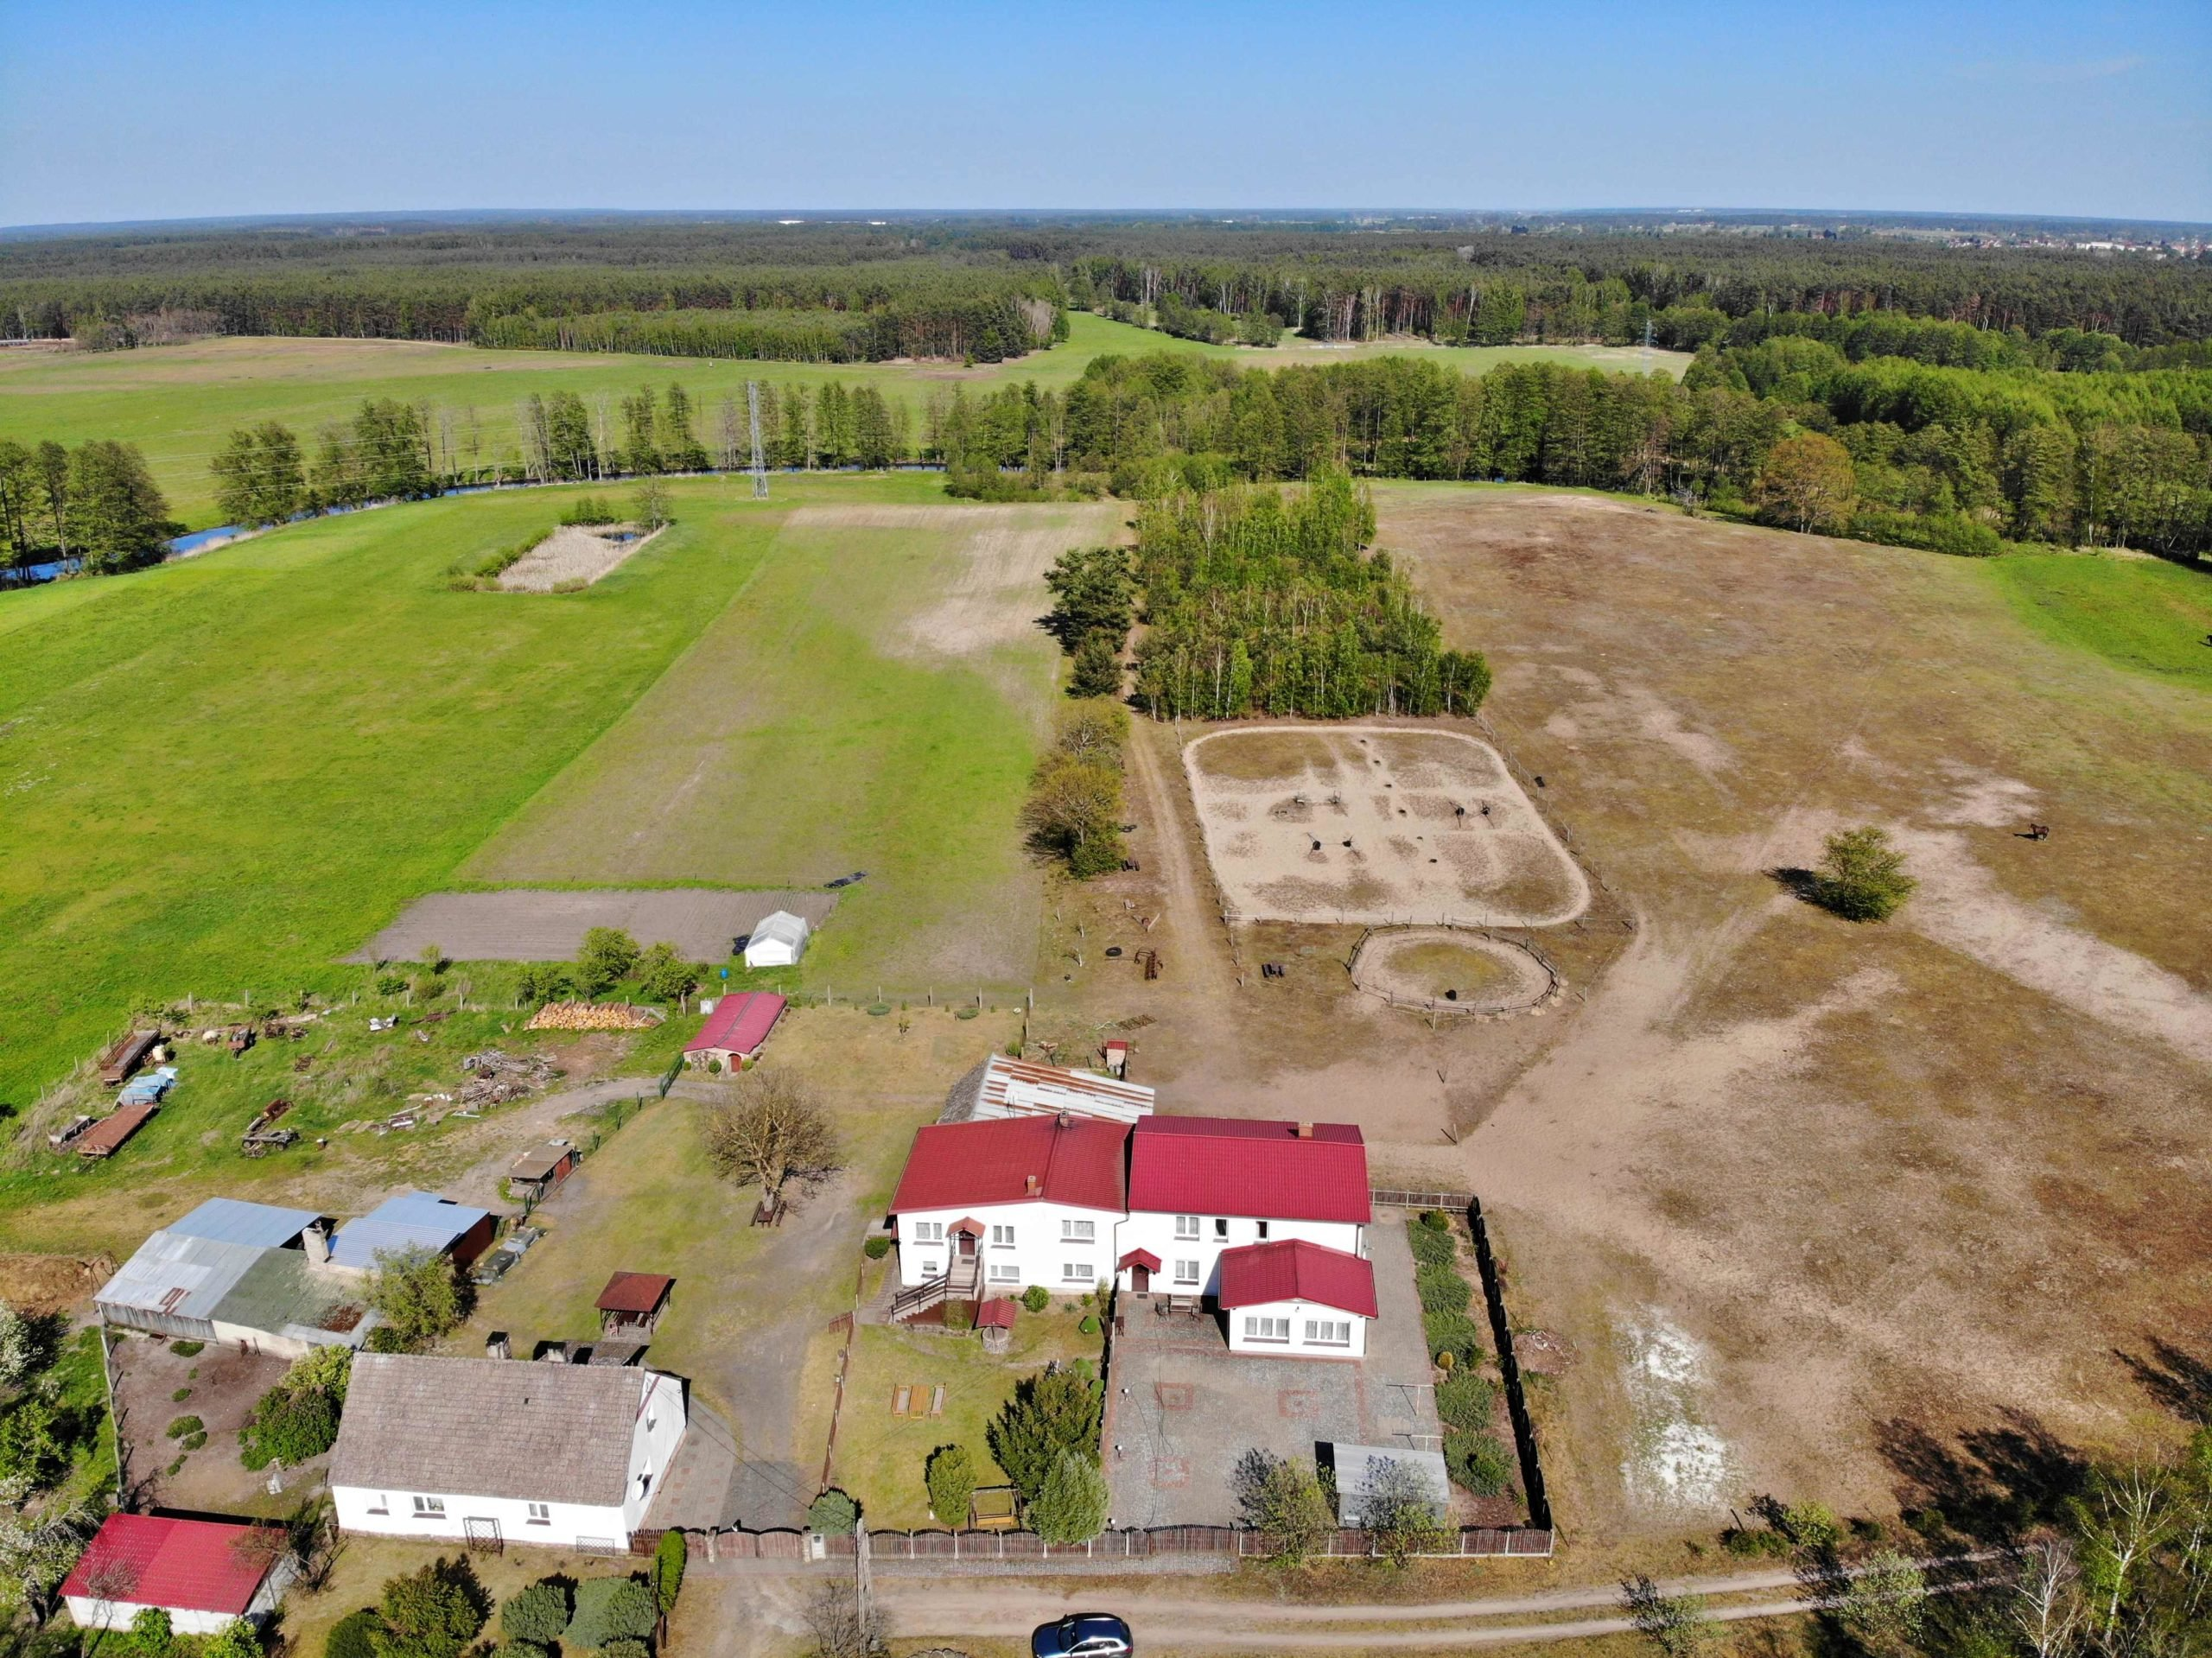 Nieruchomość gruntowa 151.560 m2 (15,16 ha)